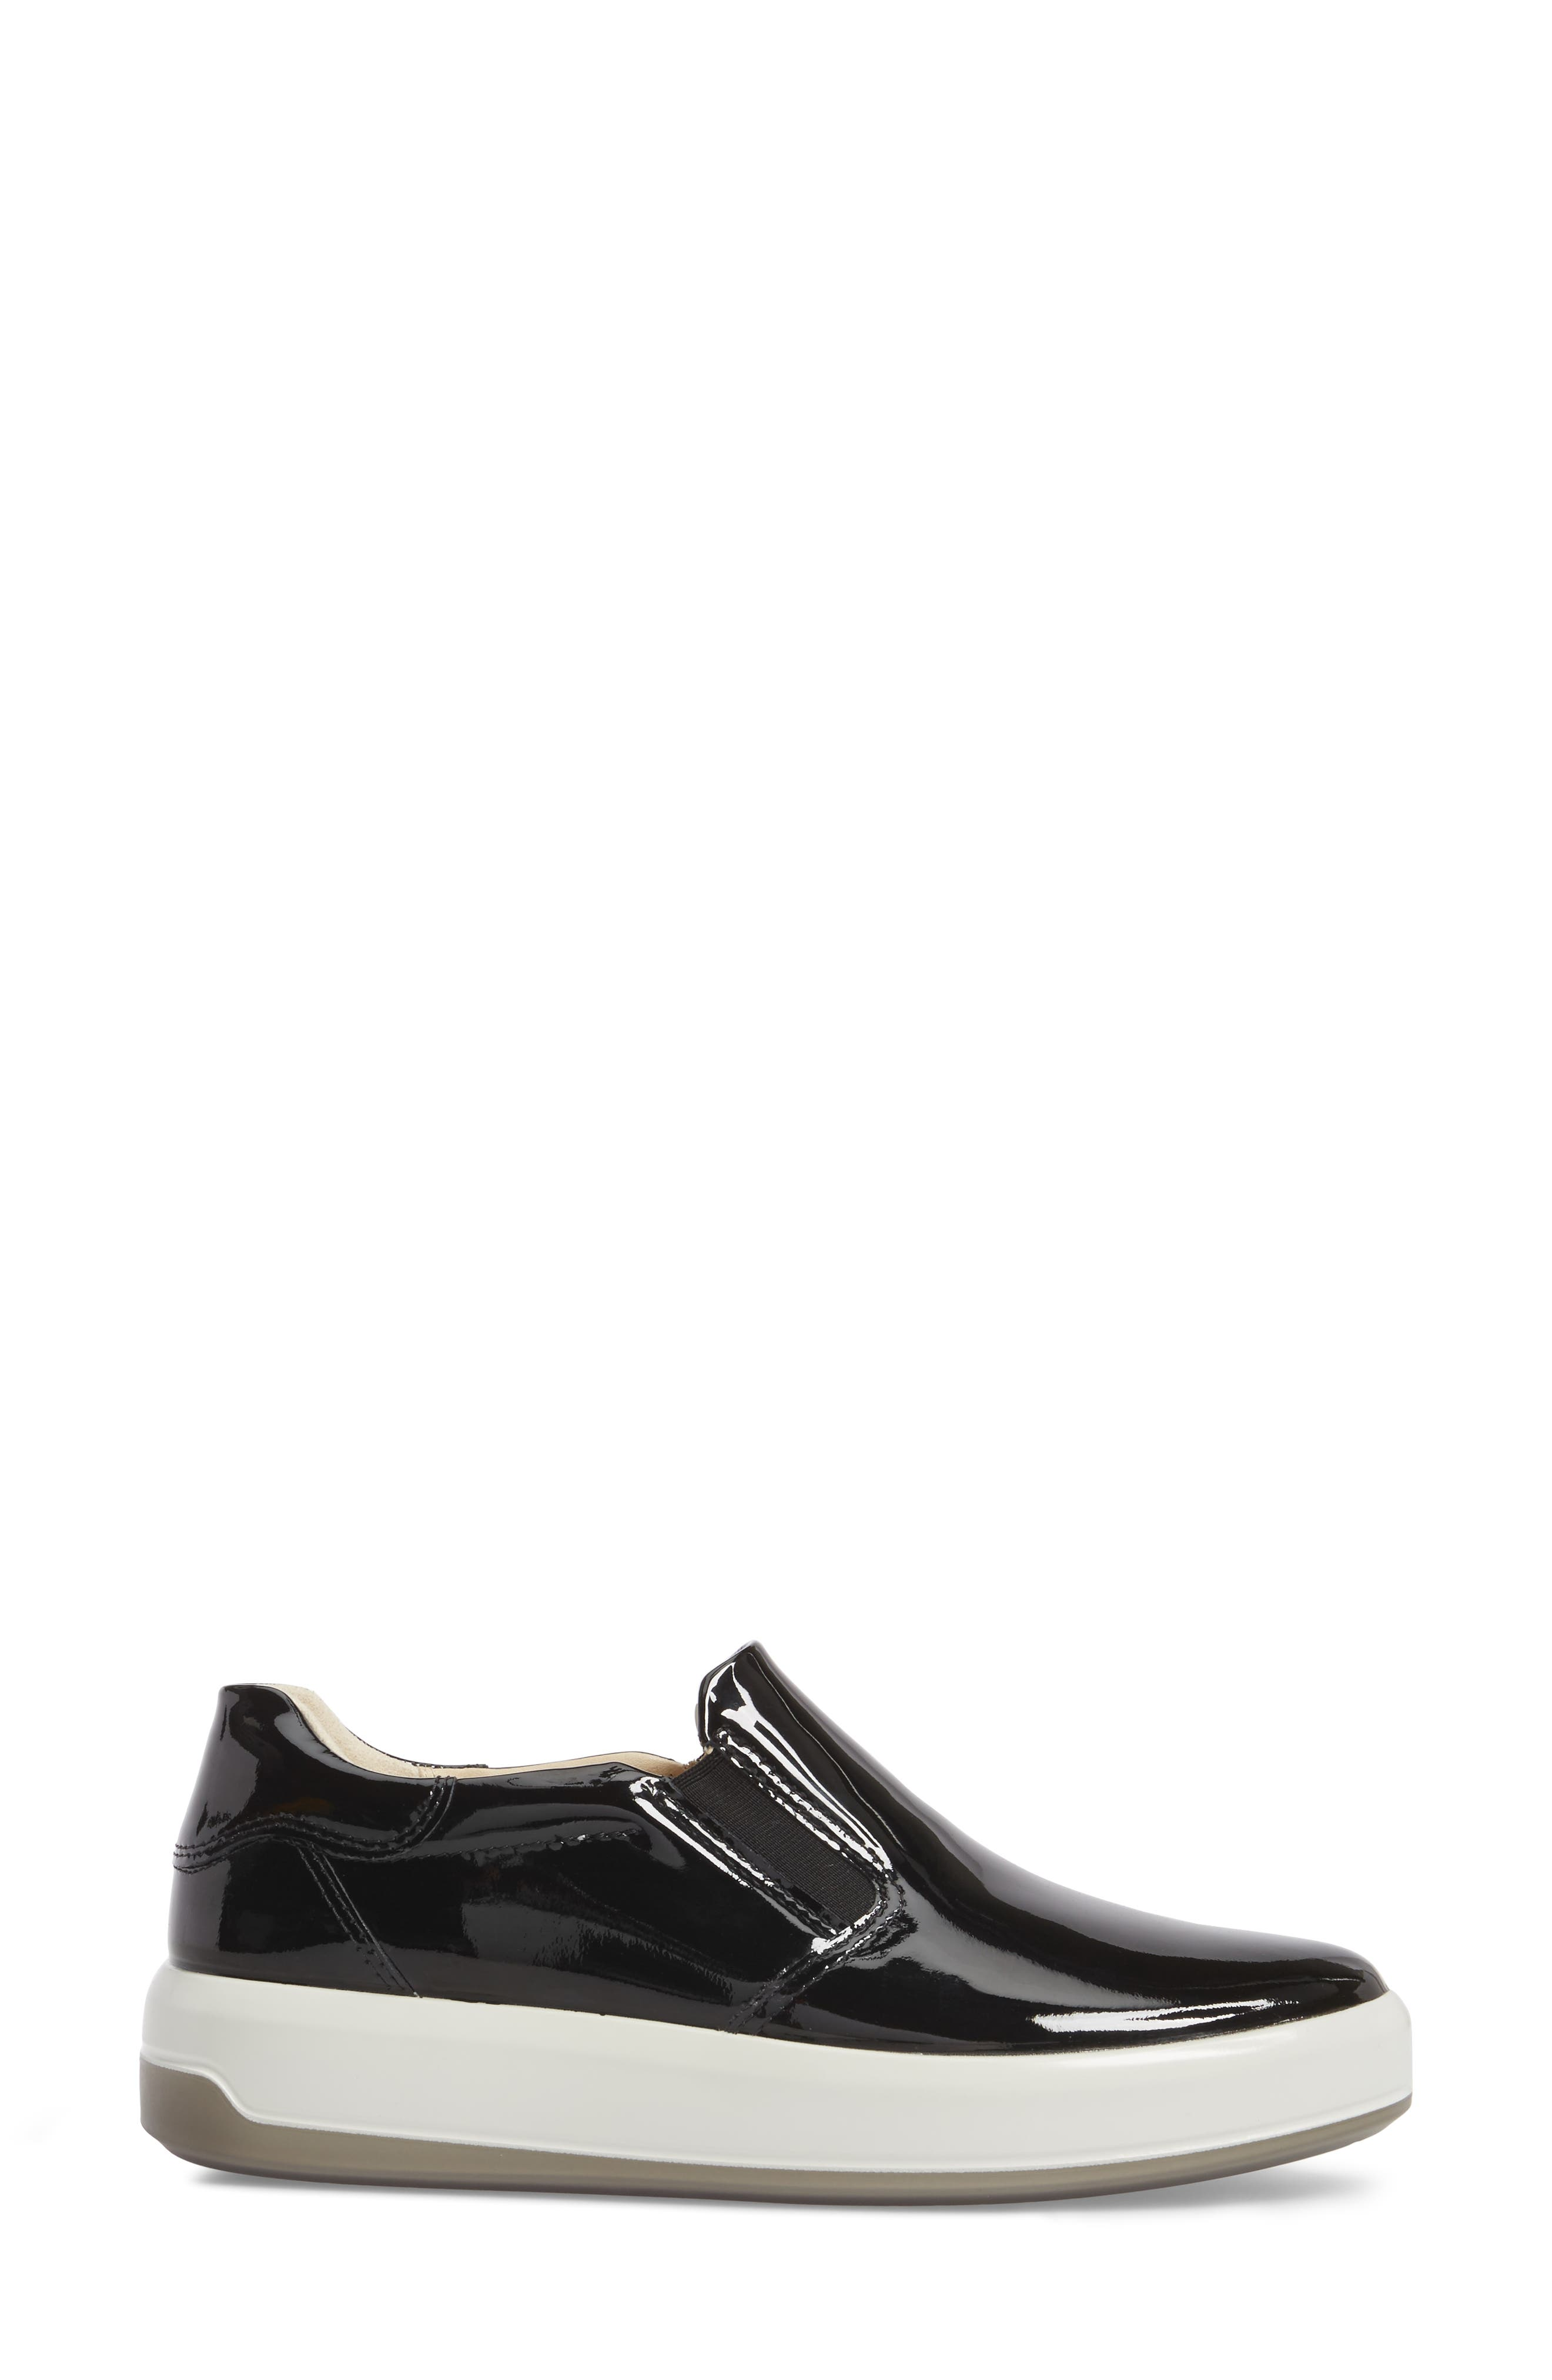 Soft 9 Slip-On Sneaker,                             Alternate thumbnail 3, color,                             Black Patent Leather